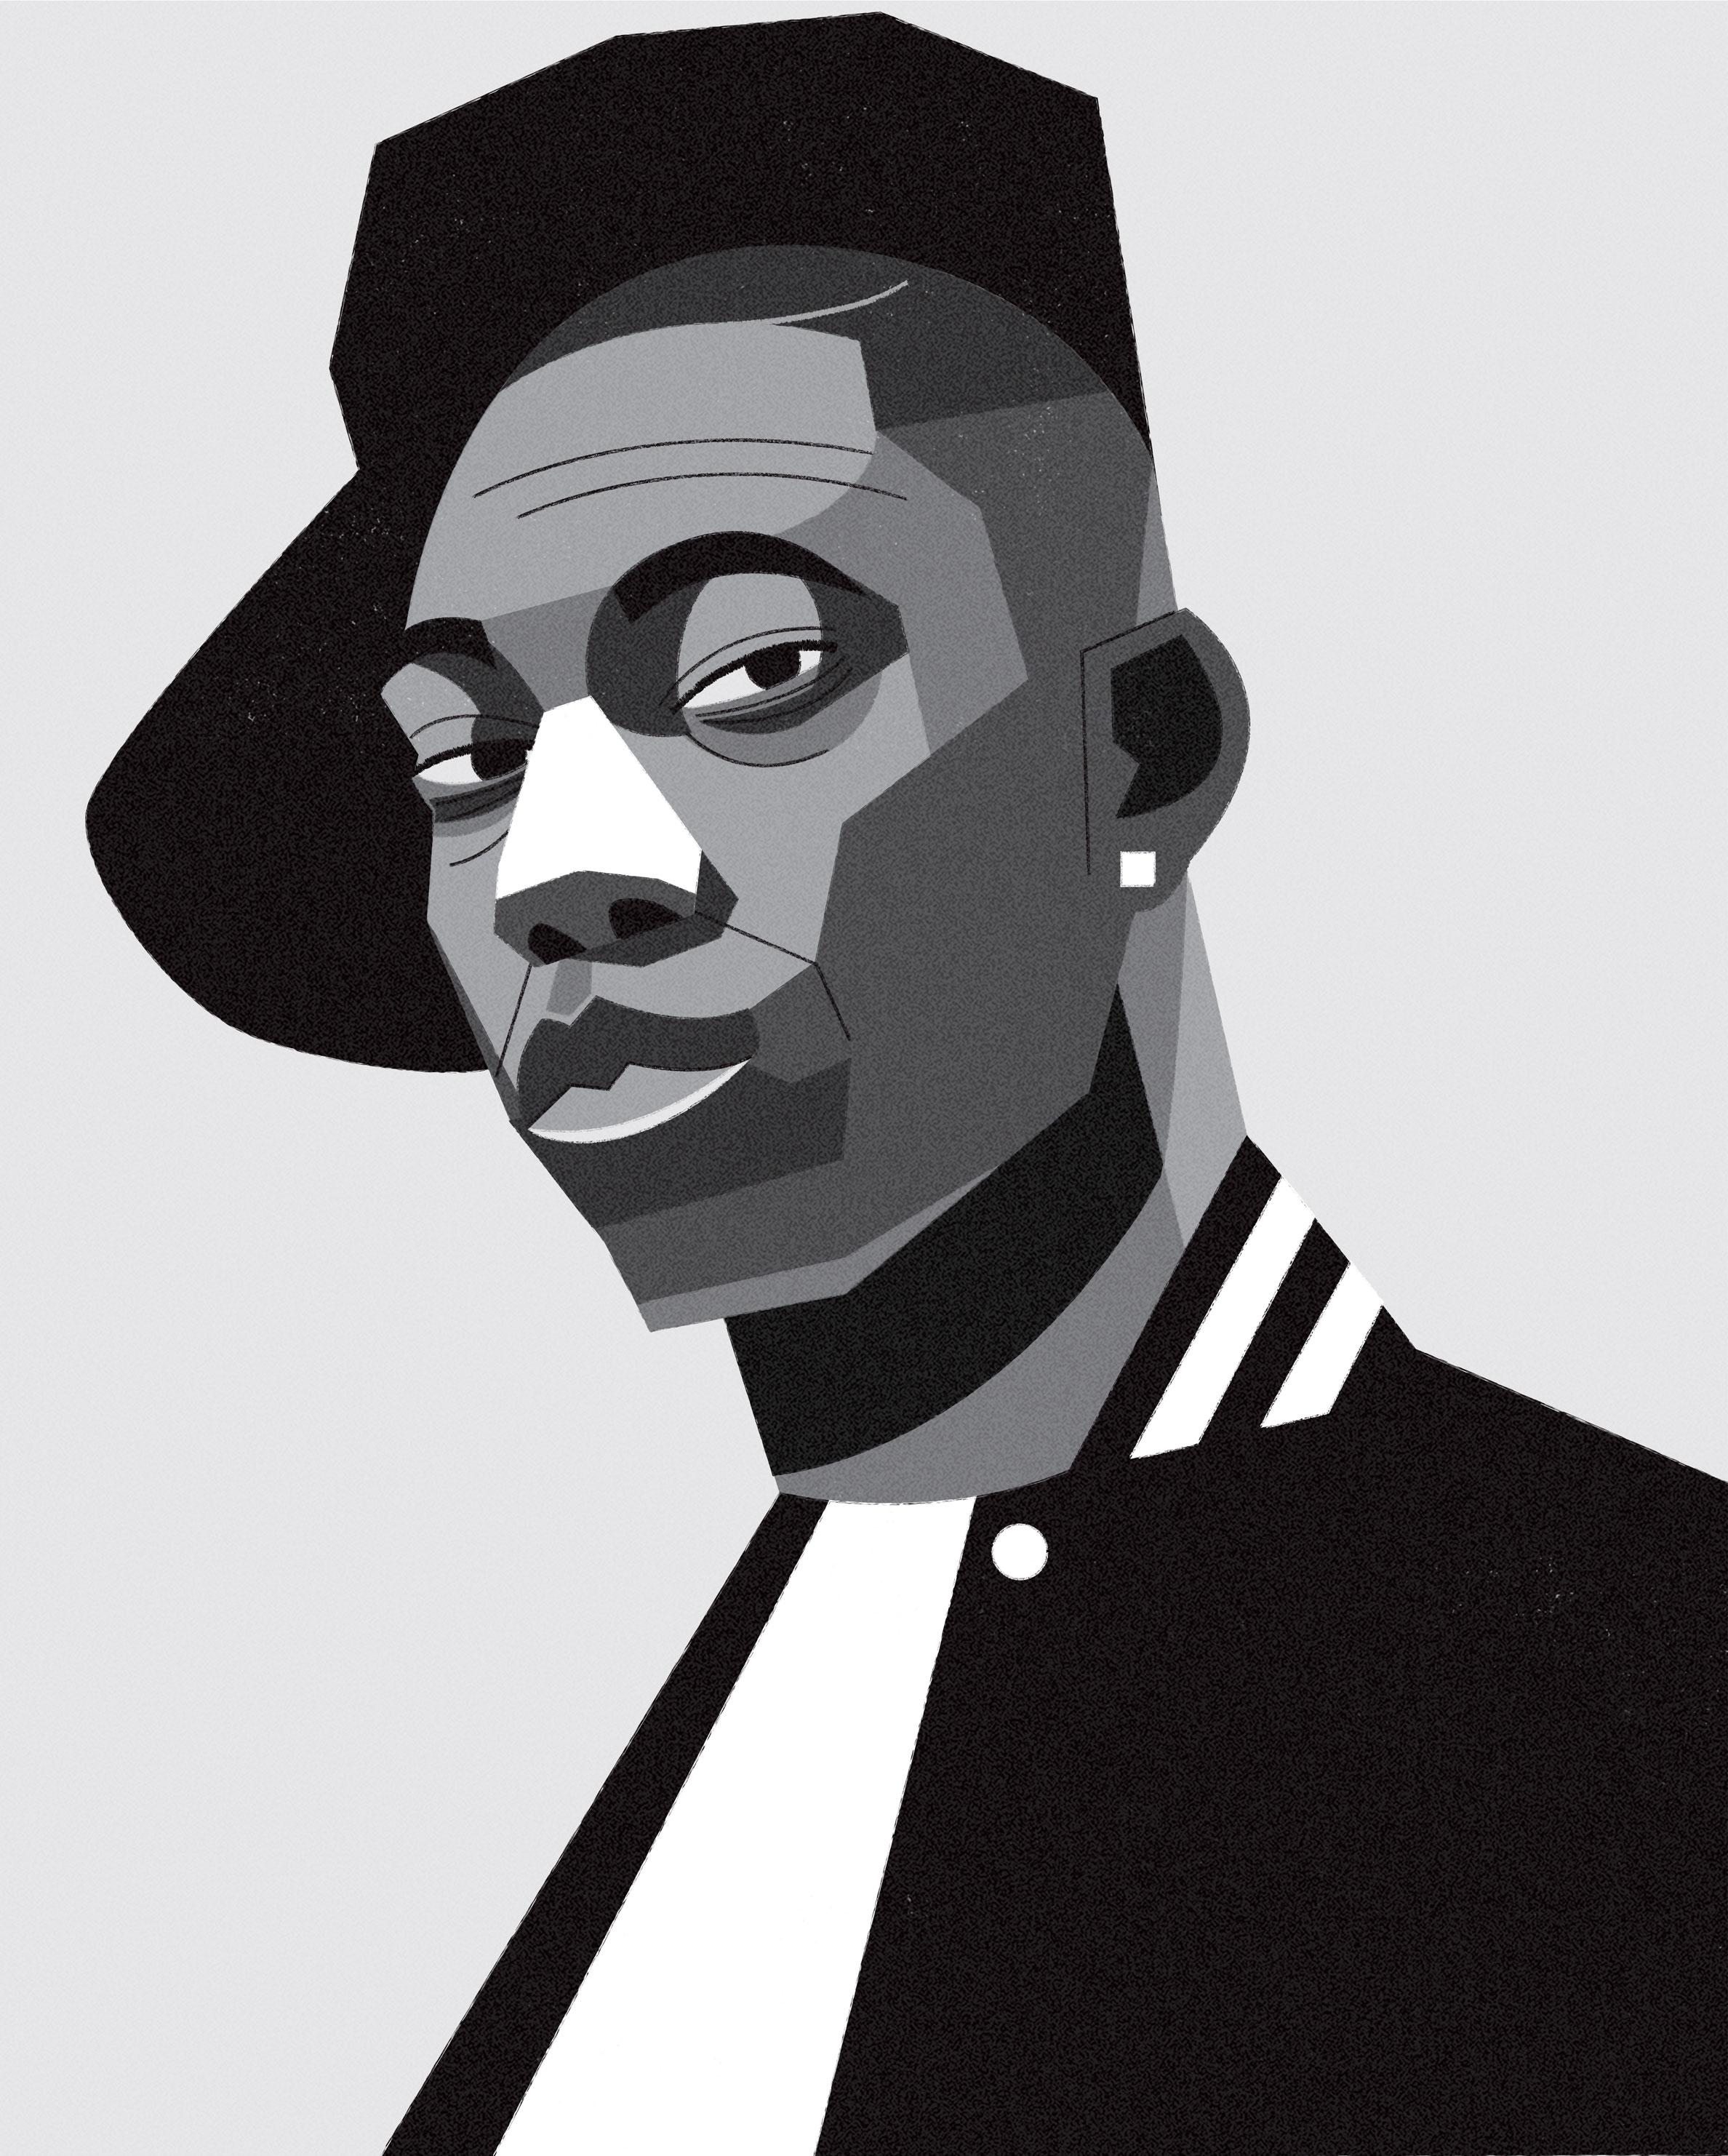 dale edwin murray freelance illustrator dizzy rascal grime uk portrait illustration